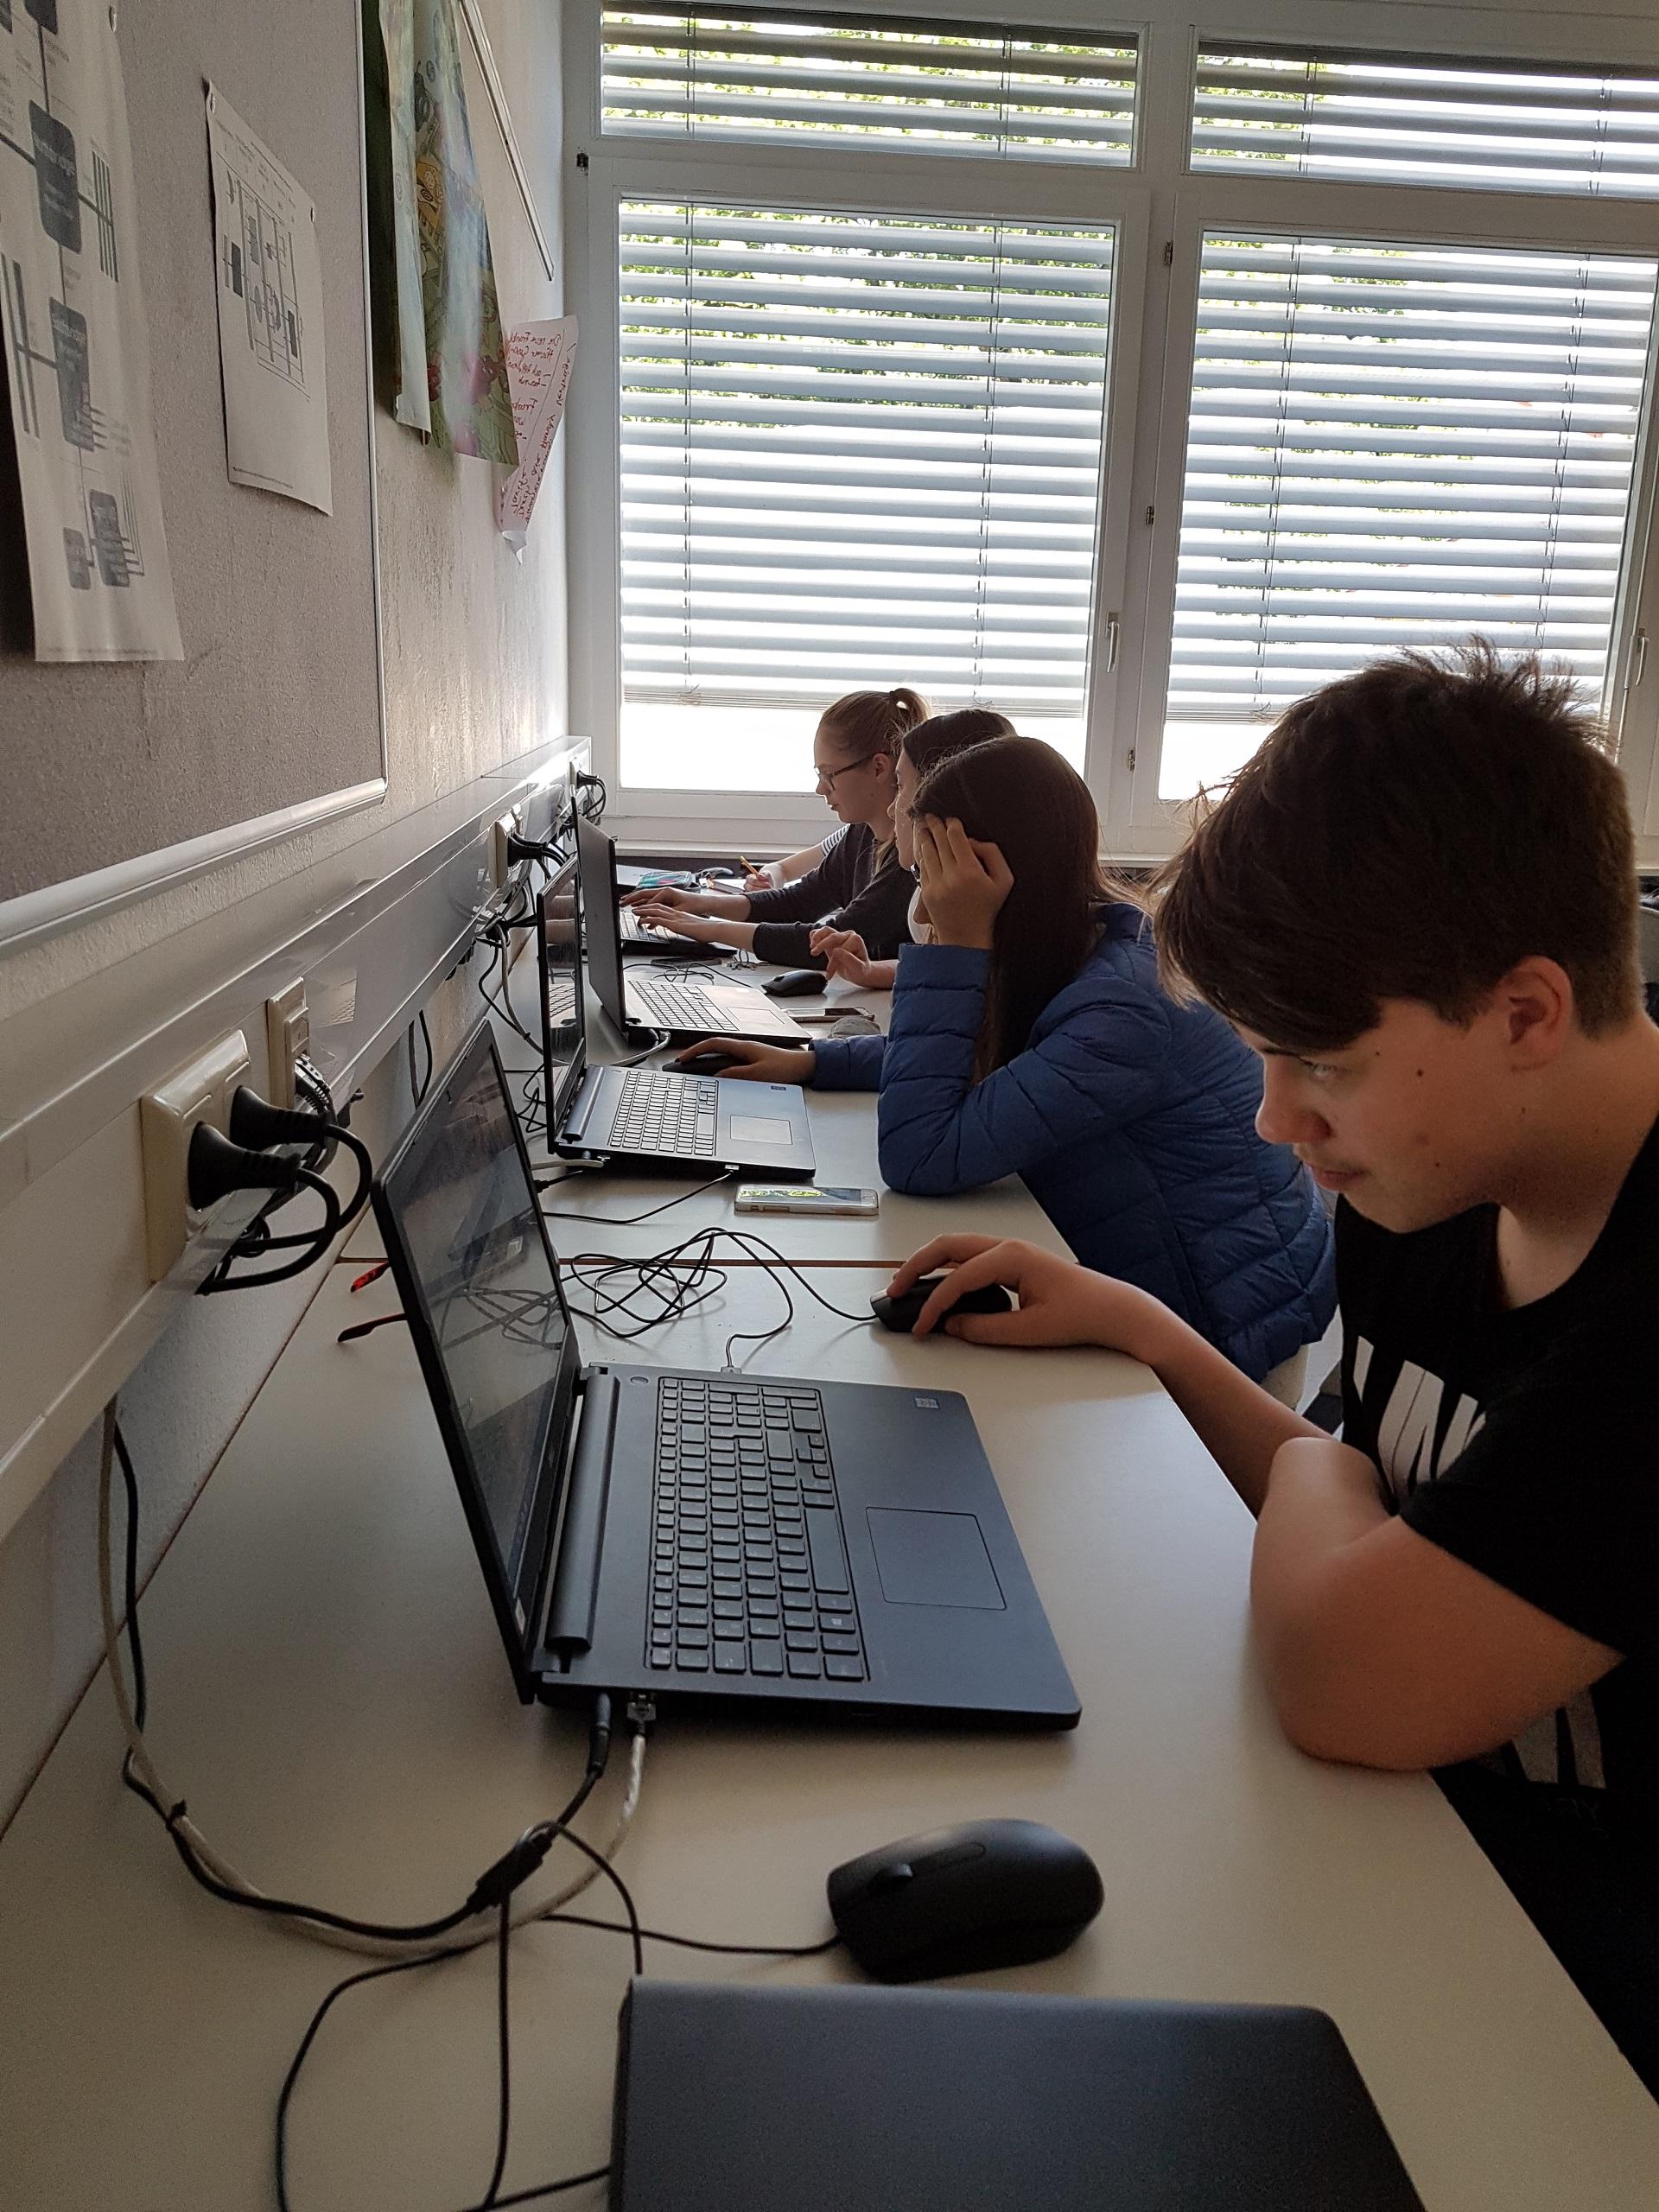 Pirmoji virtuali lietuvių kalbos viktorina (Foto: A. D'Elia)